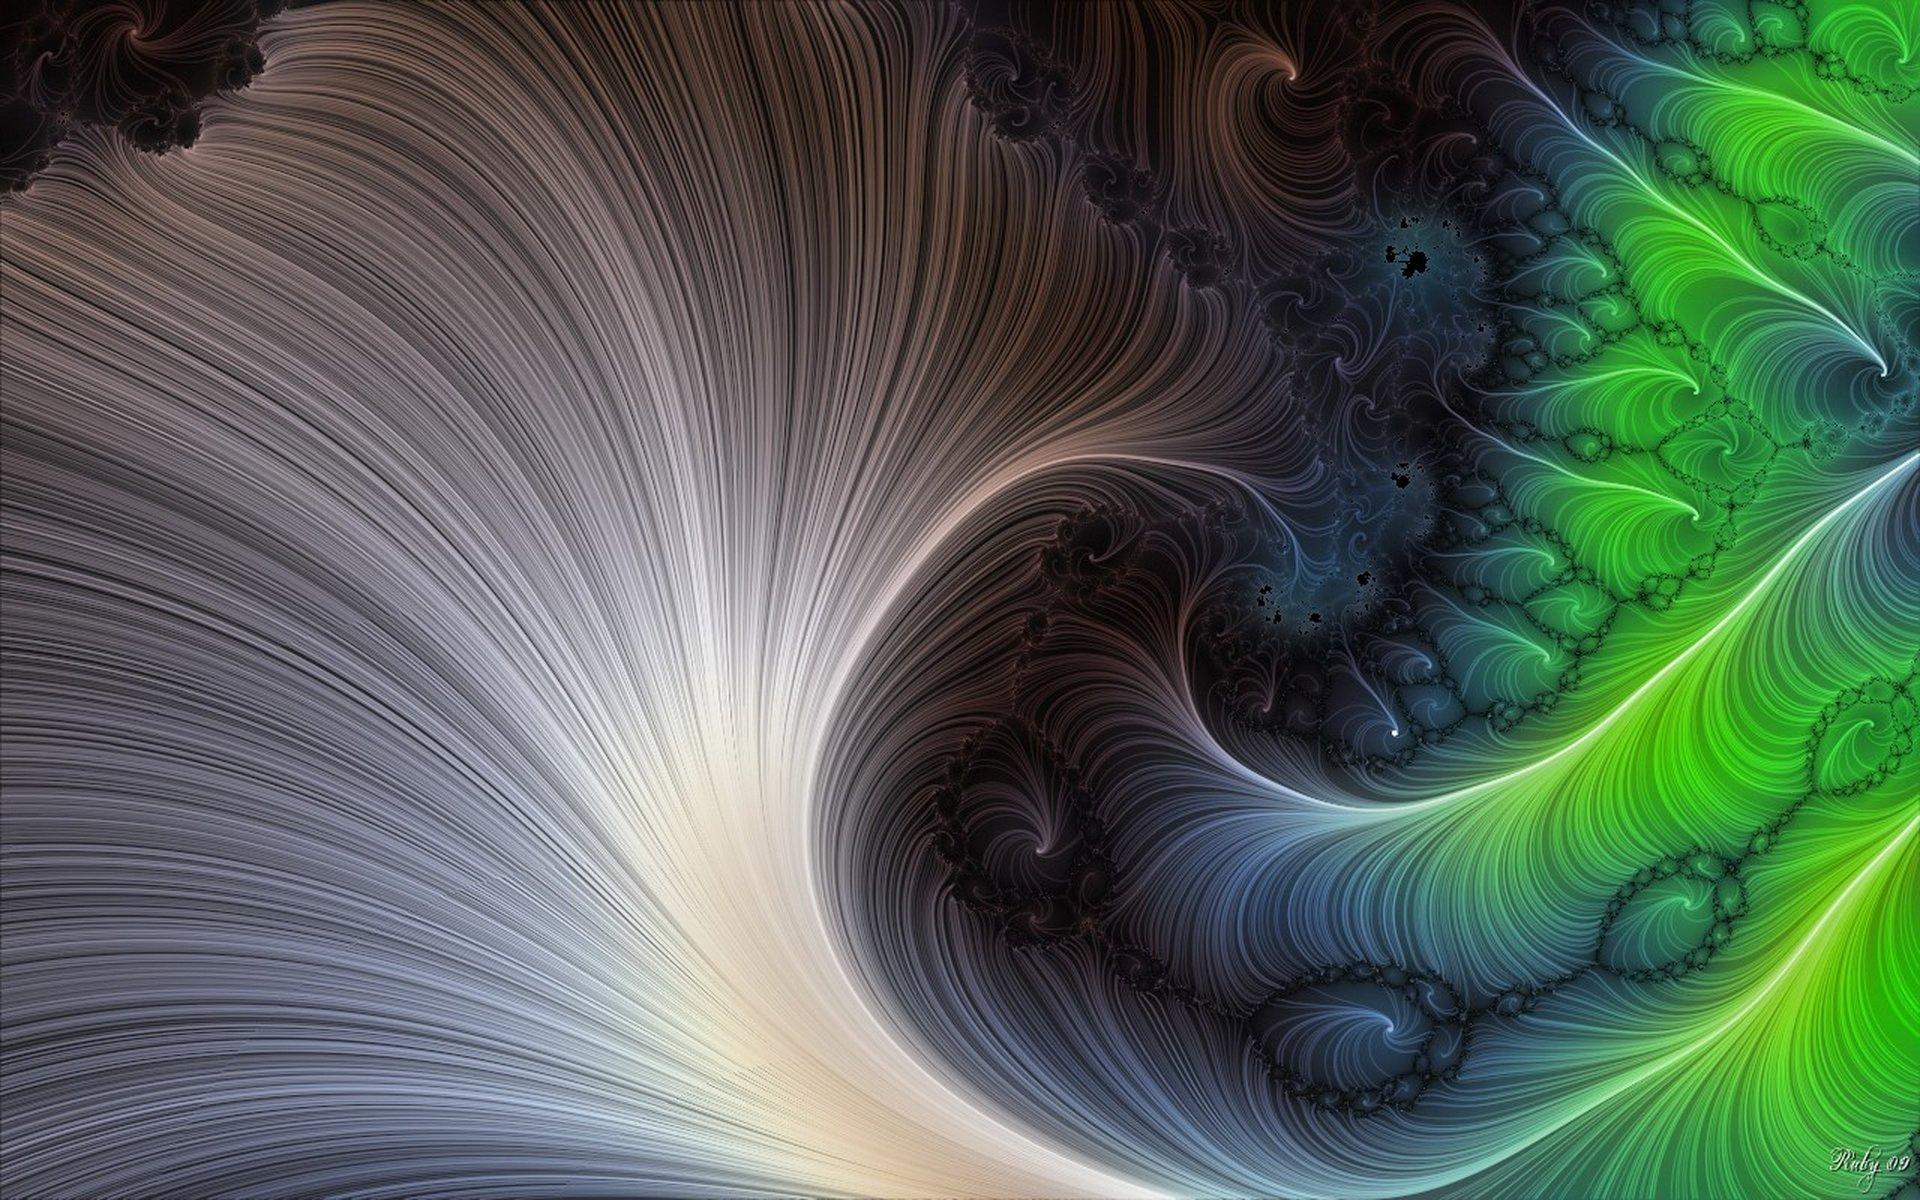 Abstract - Fractal  Abstract Swirl Green Digital Wallpaper